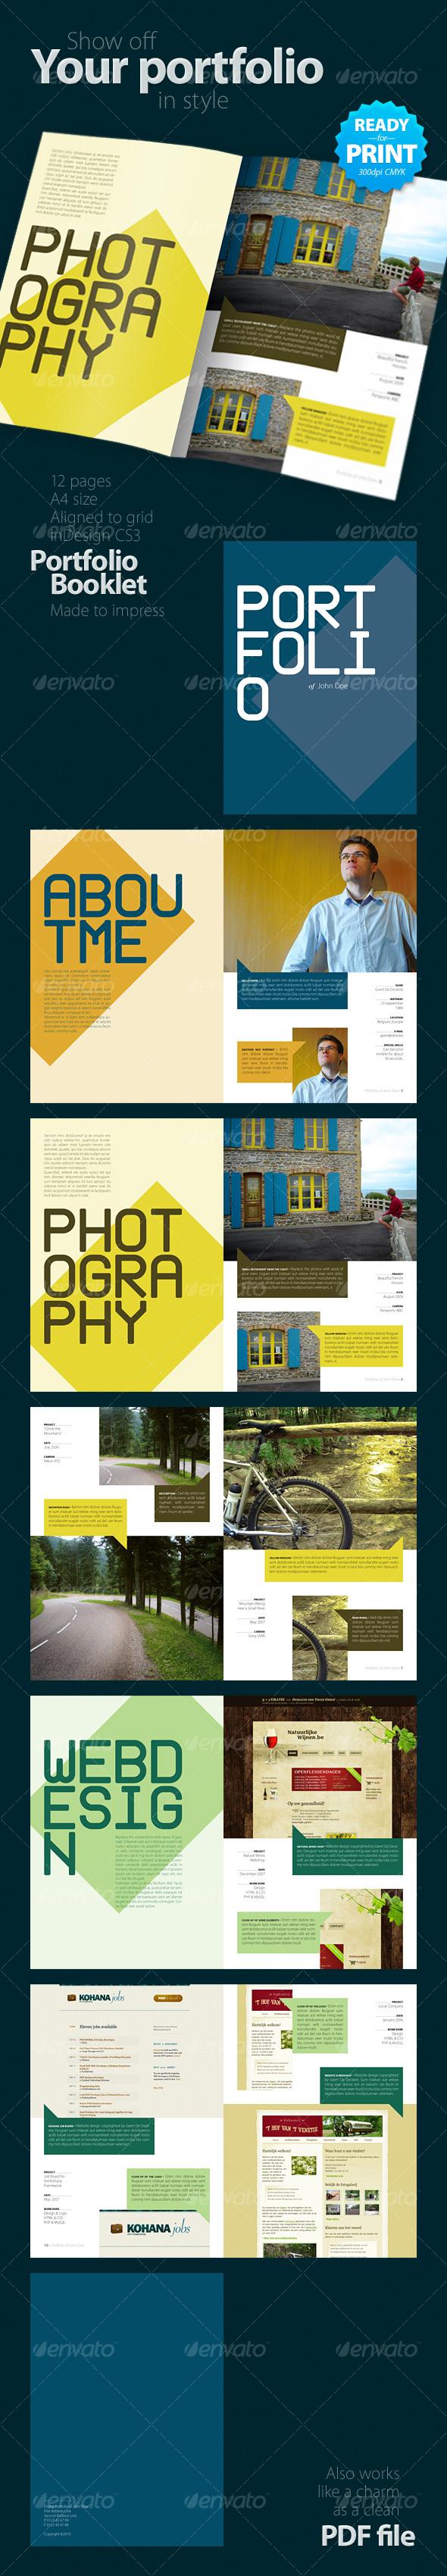 GraphicRiver Portfolio Booklet 12 pages 66218